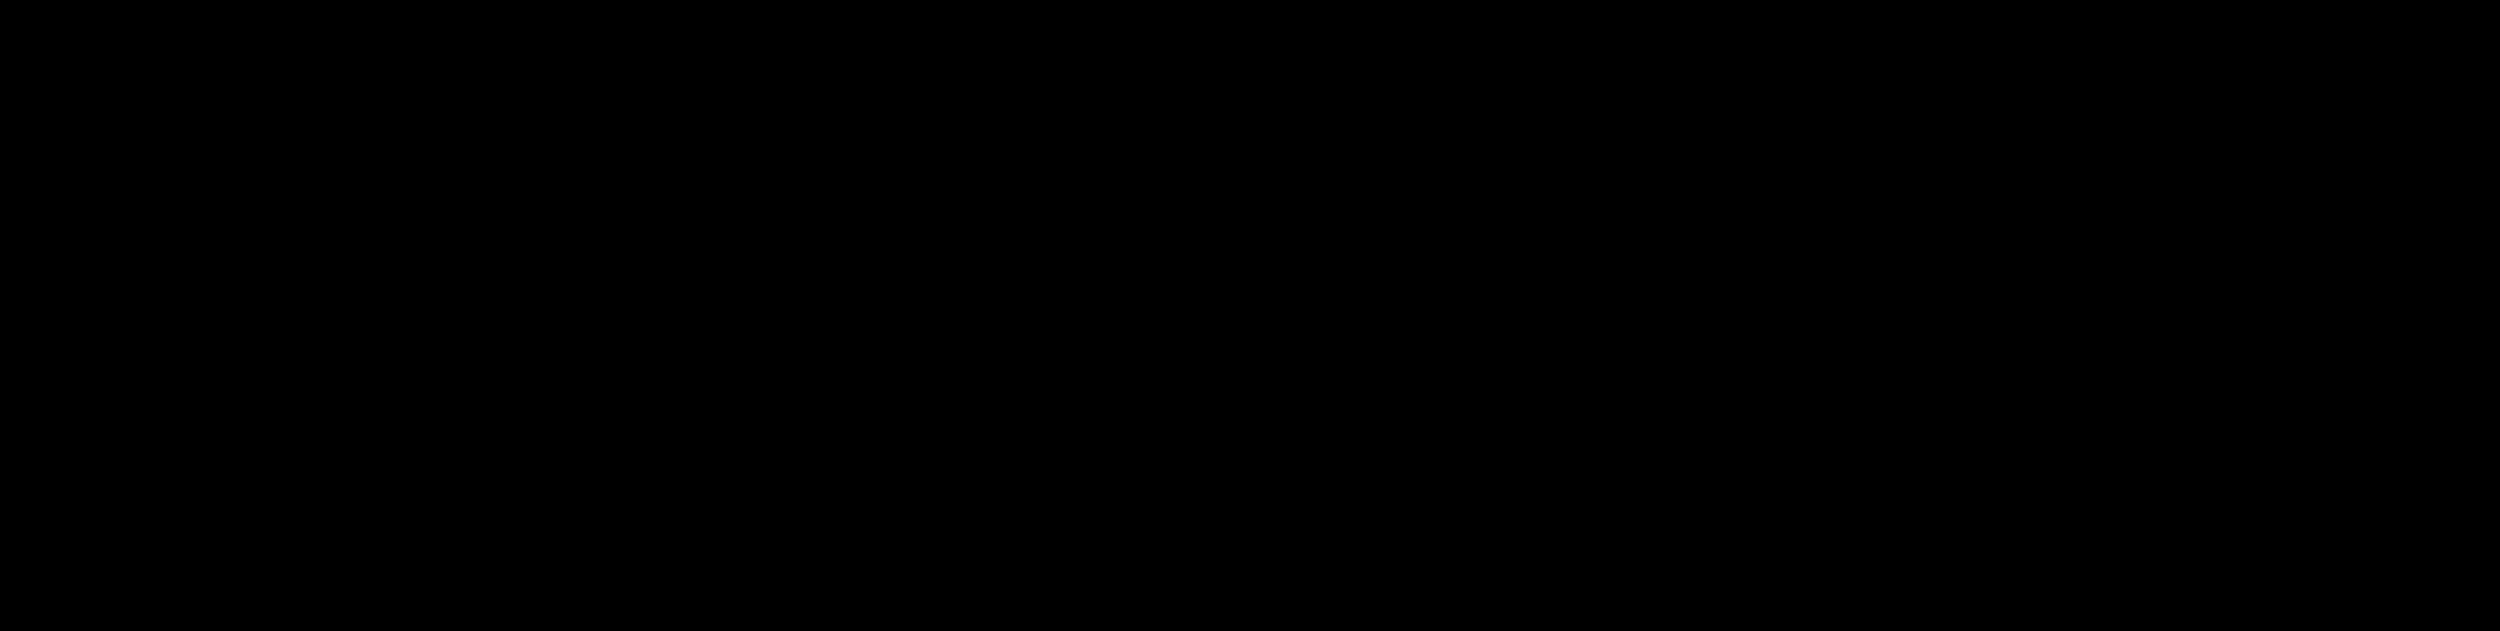 makers-logo-black.png